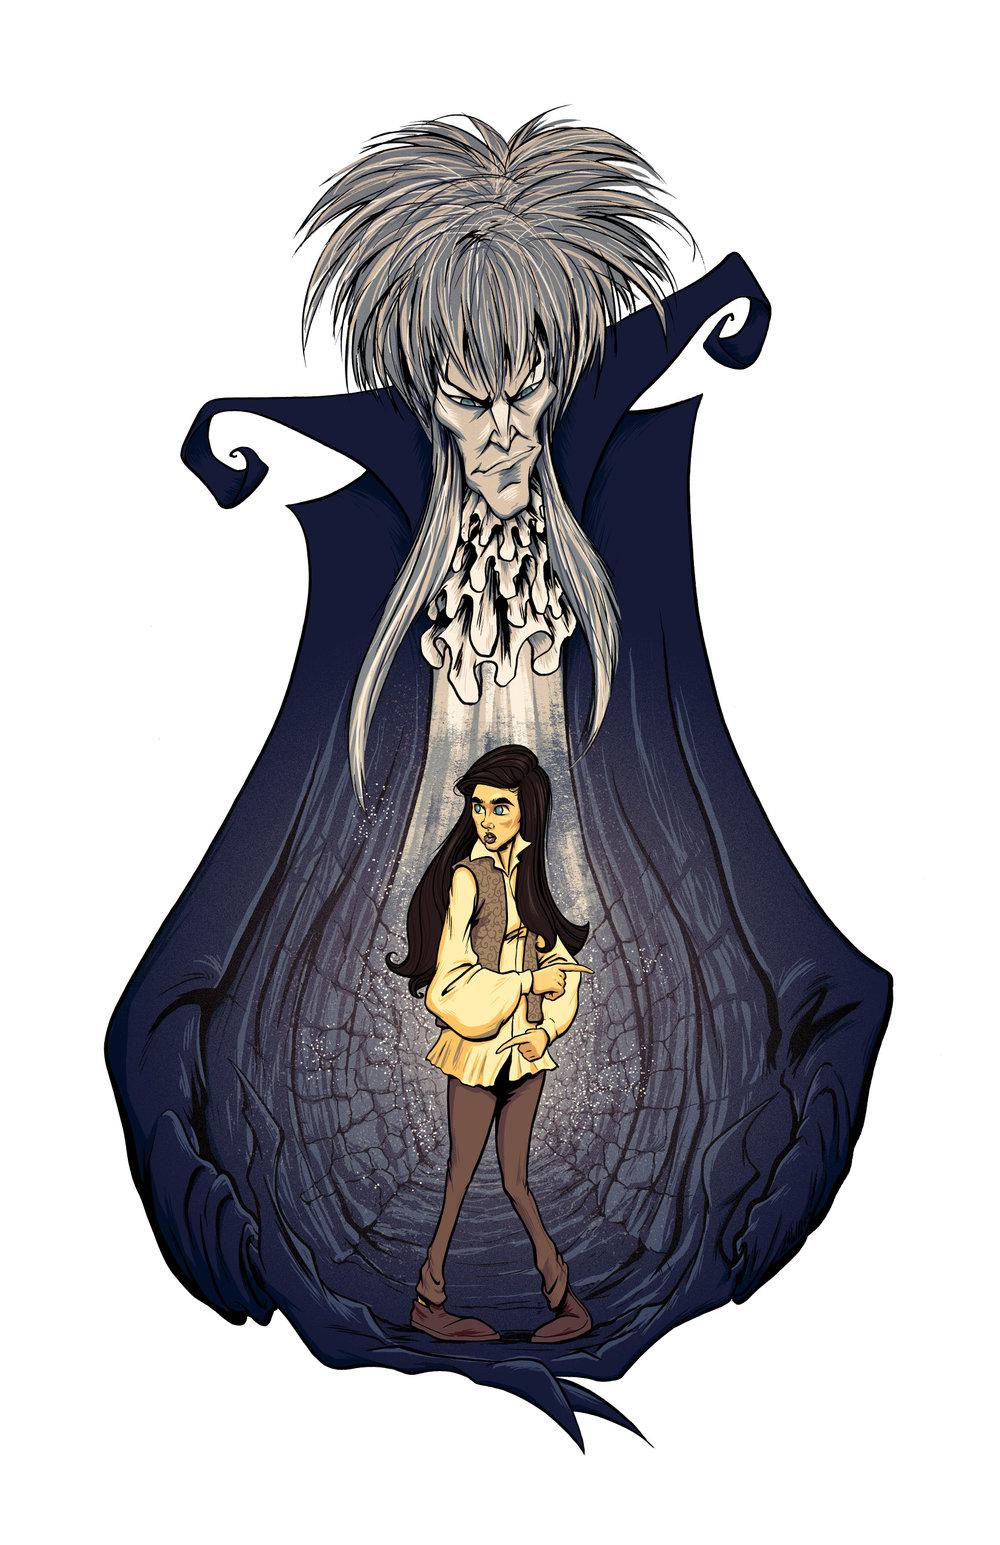 Labyrinth_11x17.jpg